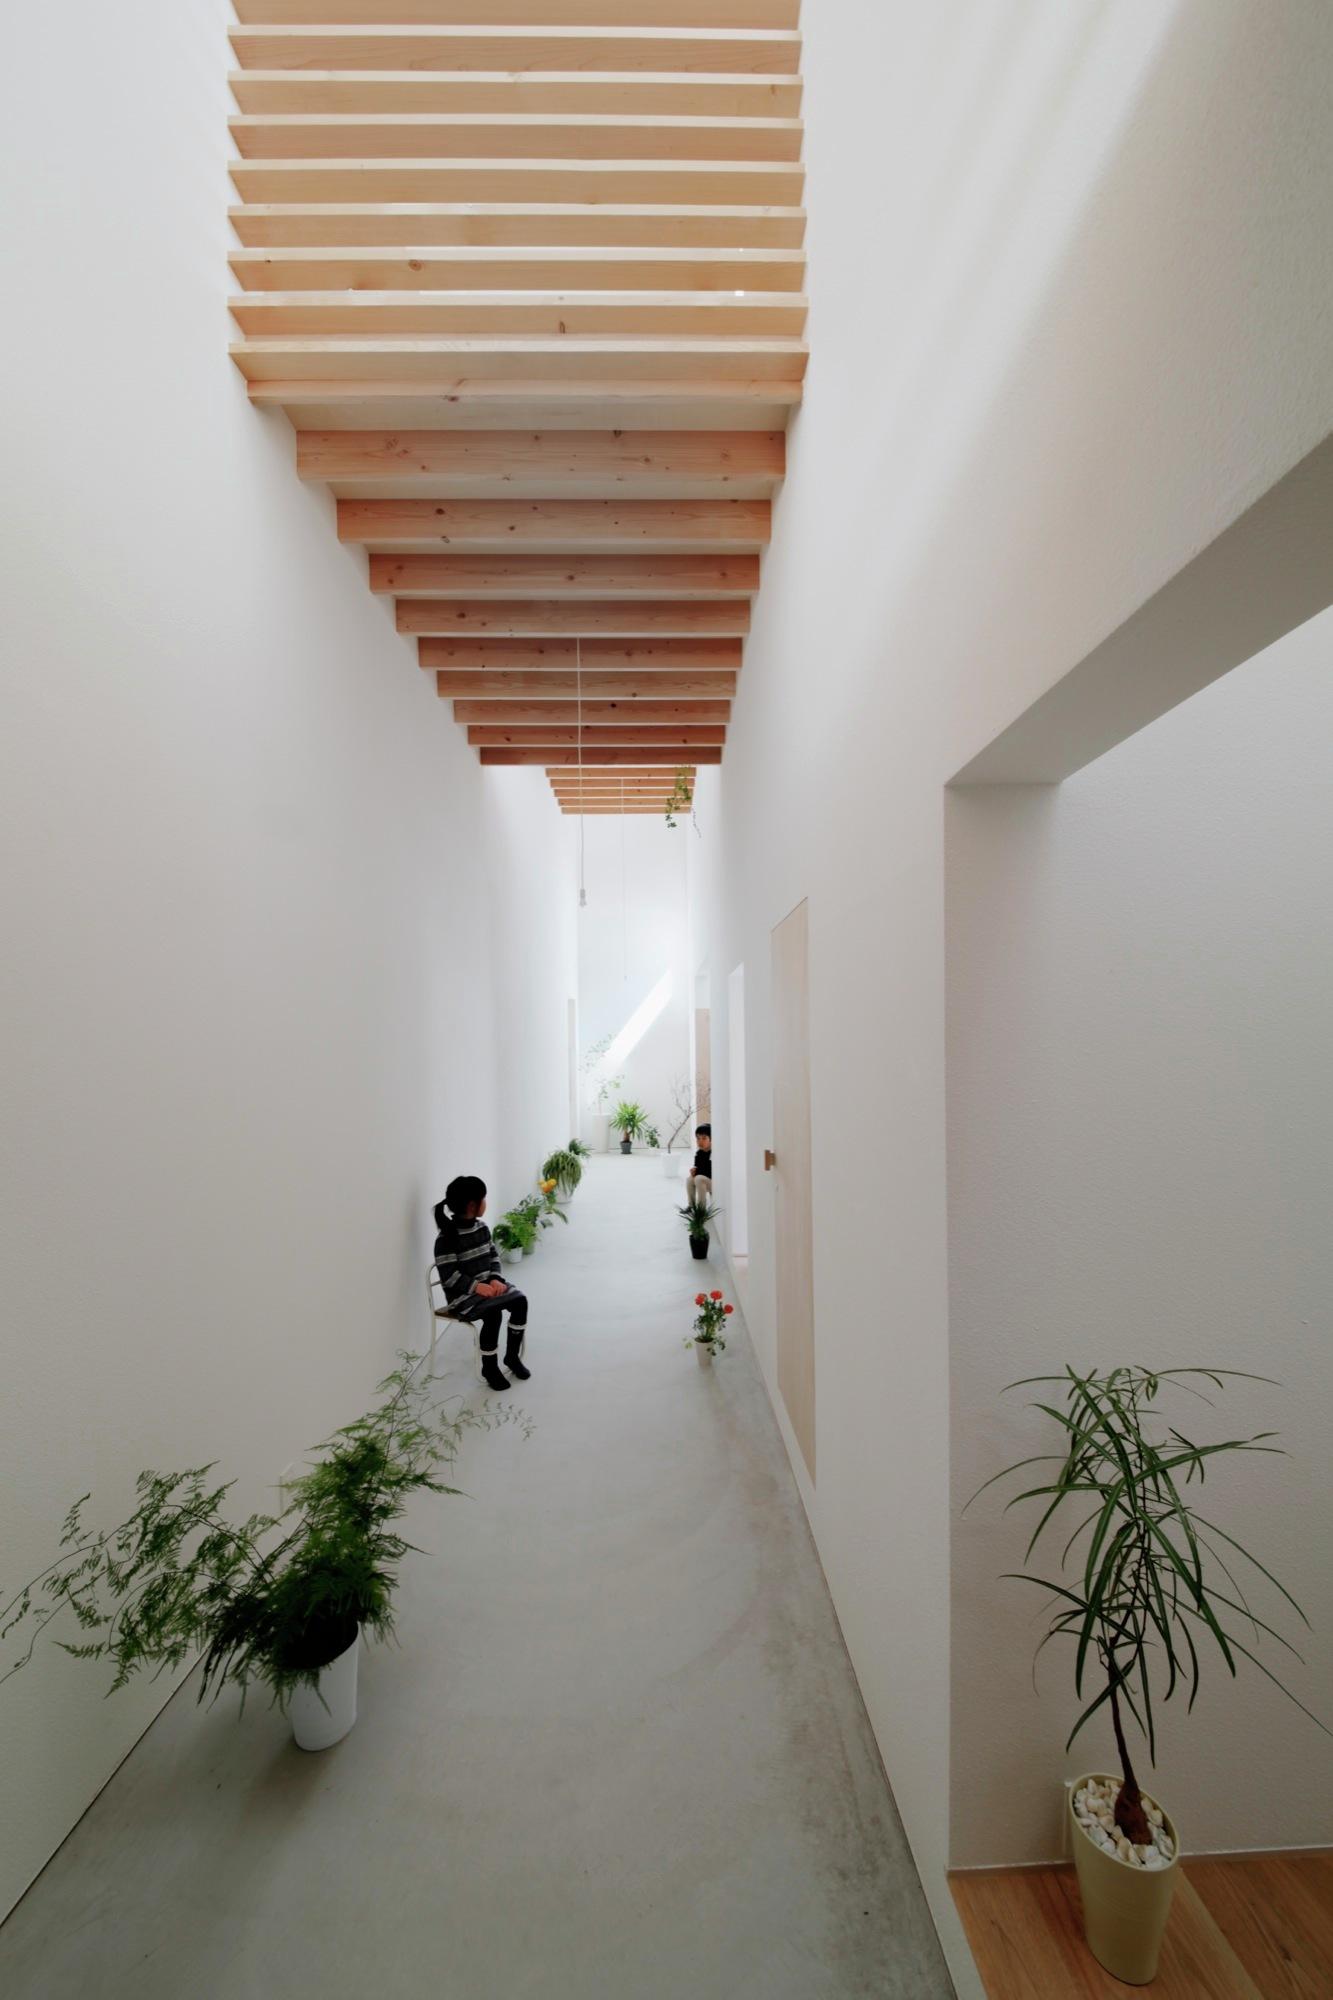 Katsutoshi Sasaki's House in Yamanote